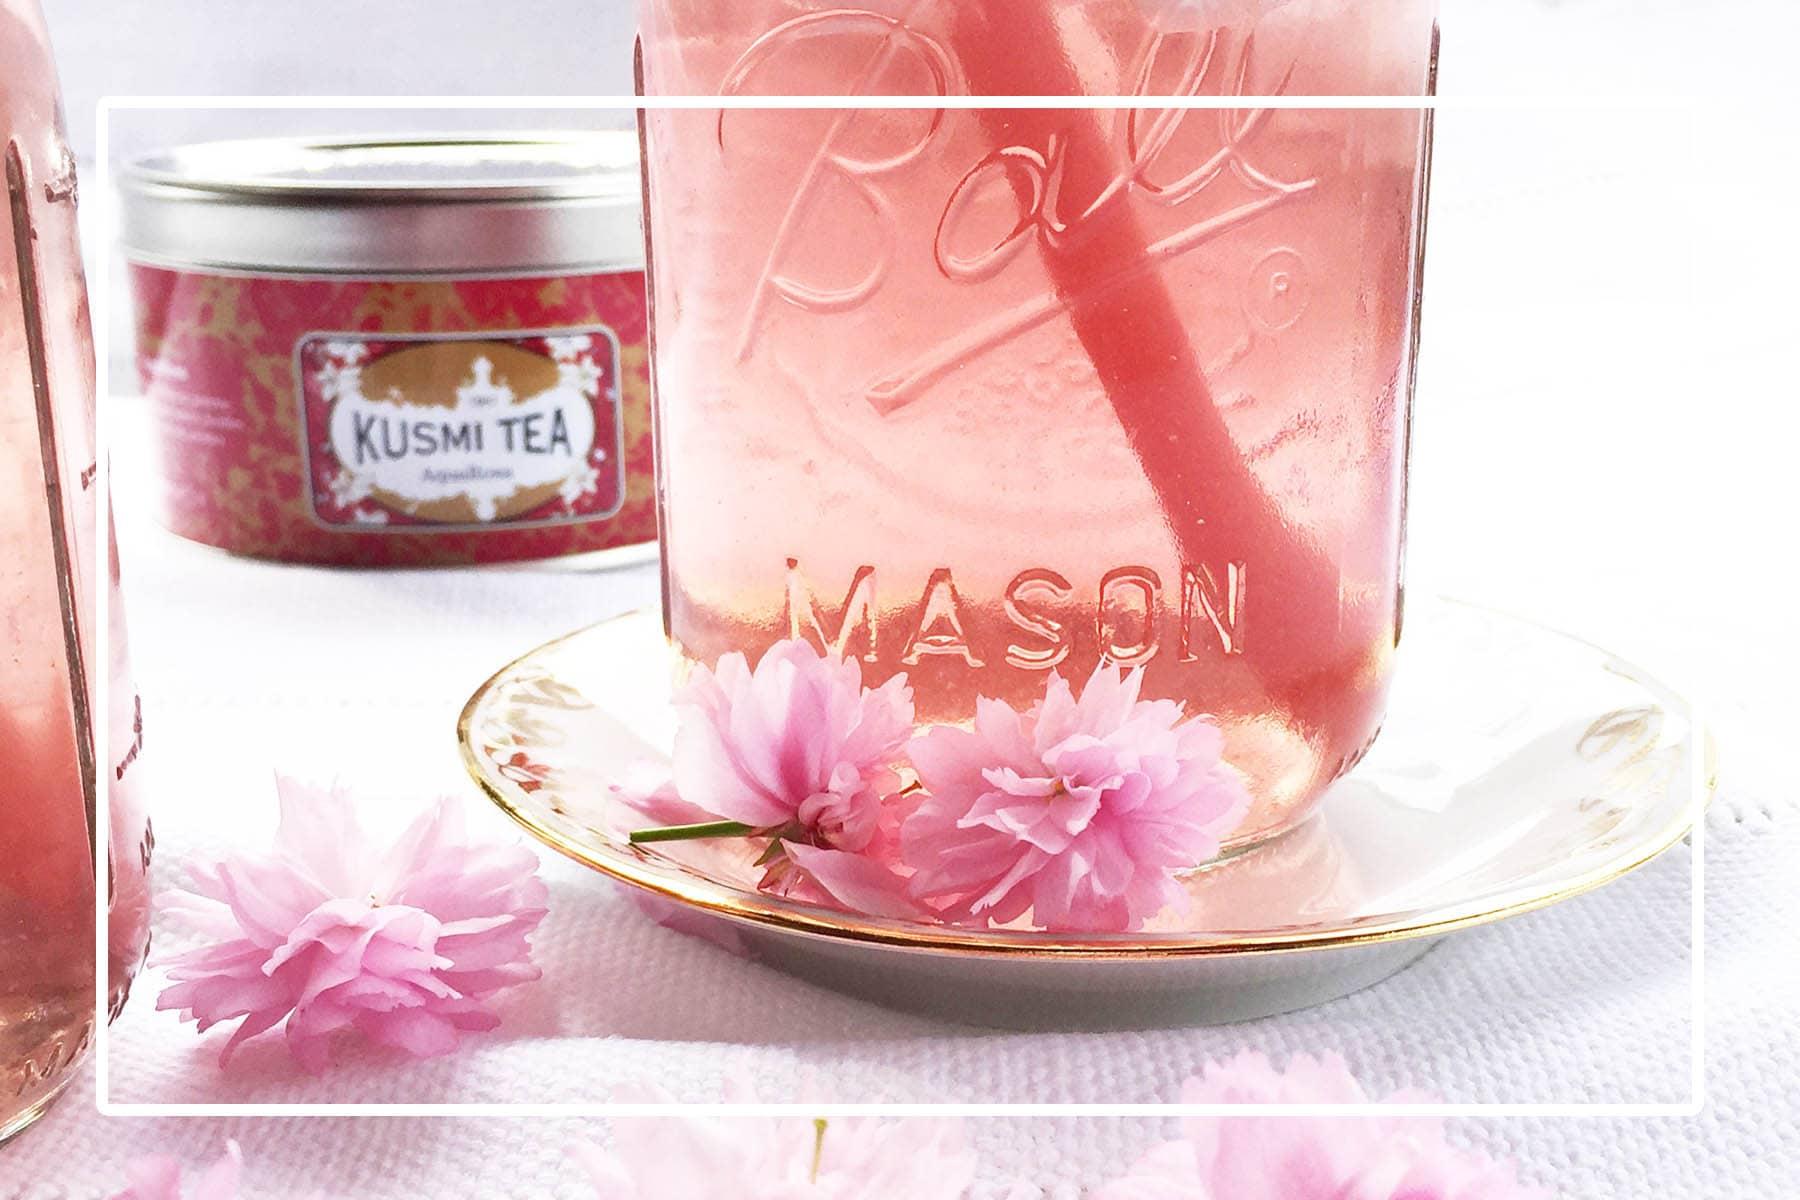 OuiPlease OuiBlog Kusmi Tea French Summer Drink AquaRose